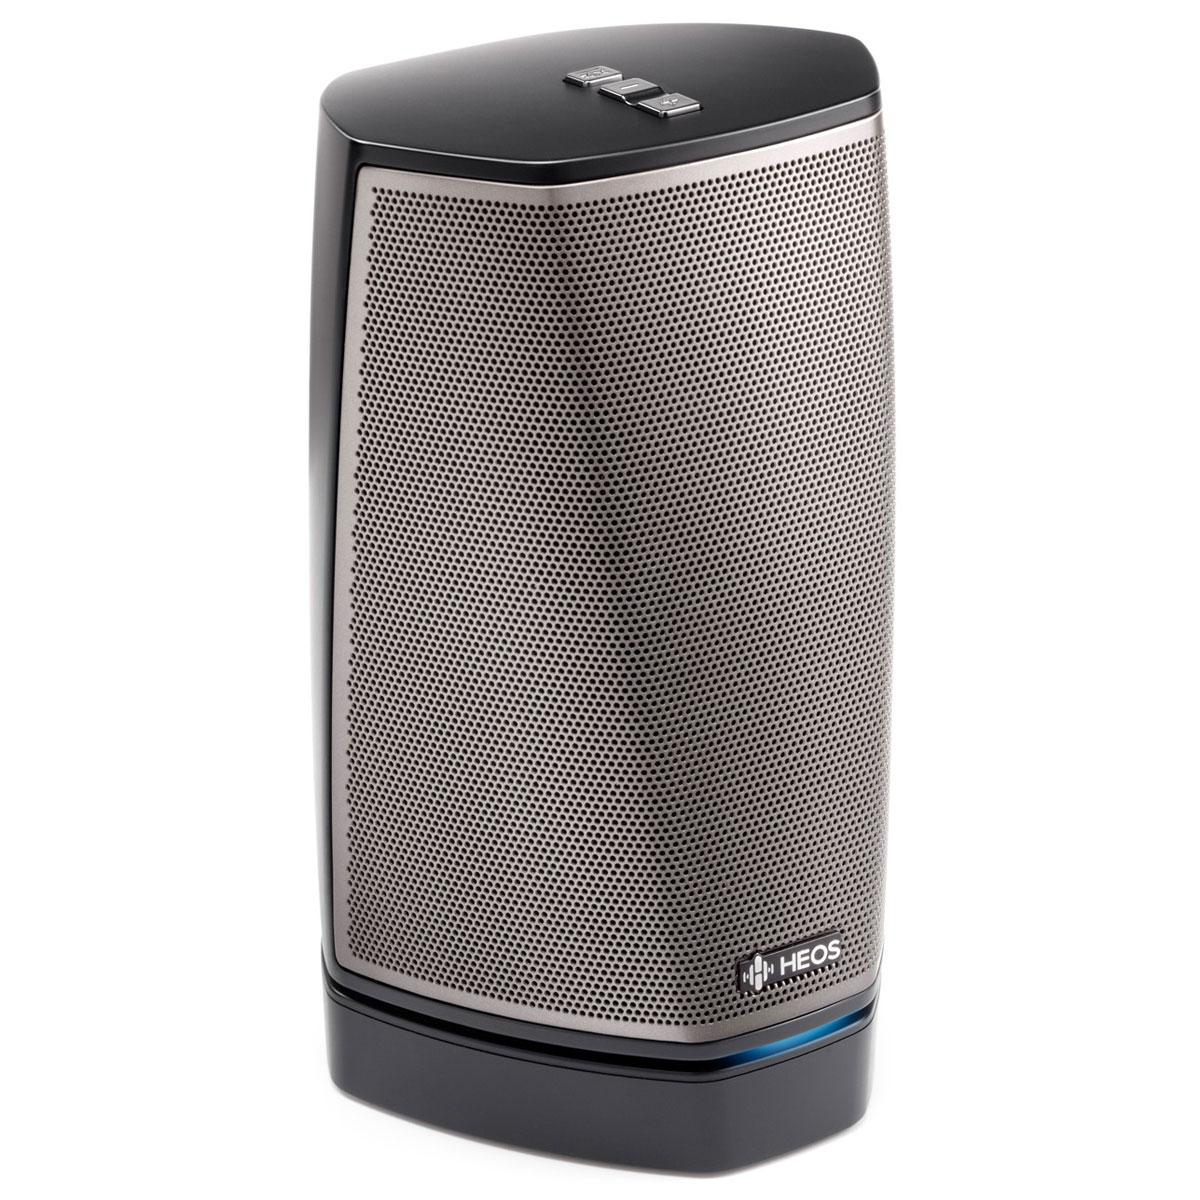 Heos 1 HS2 inkl. Go Pack schwarz Wireless-Lautsprecher